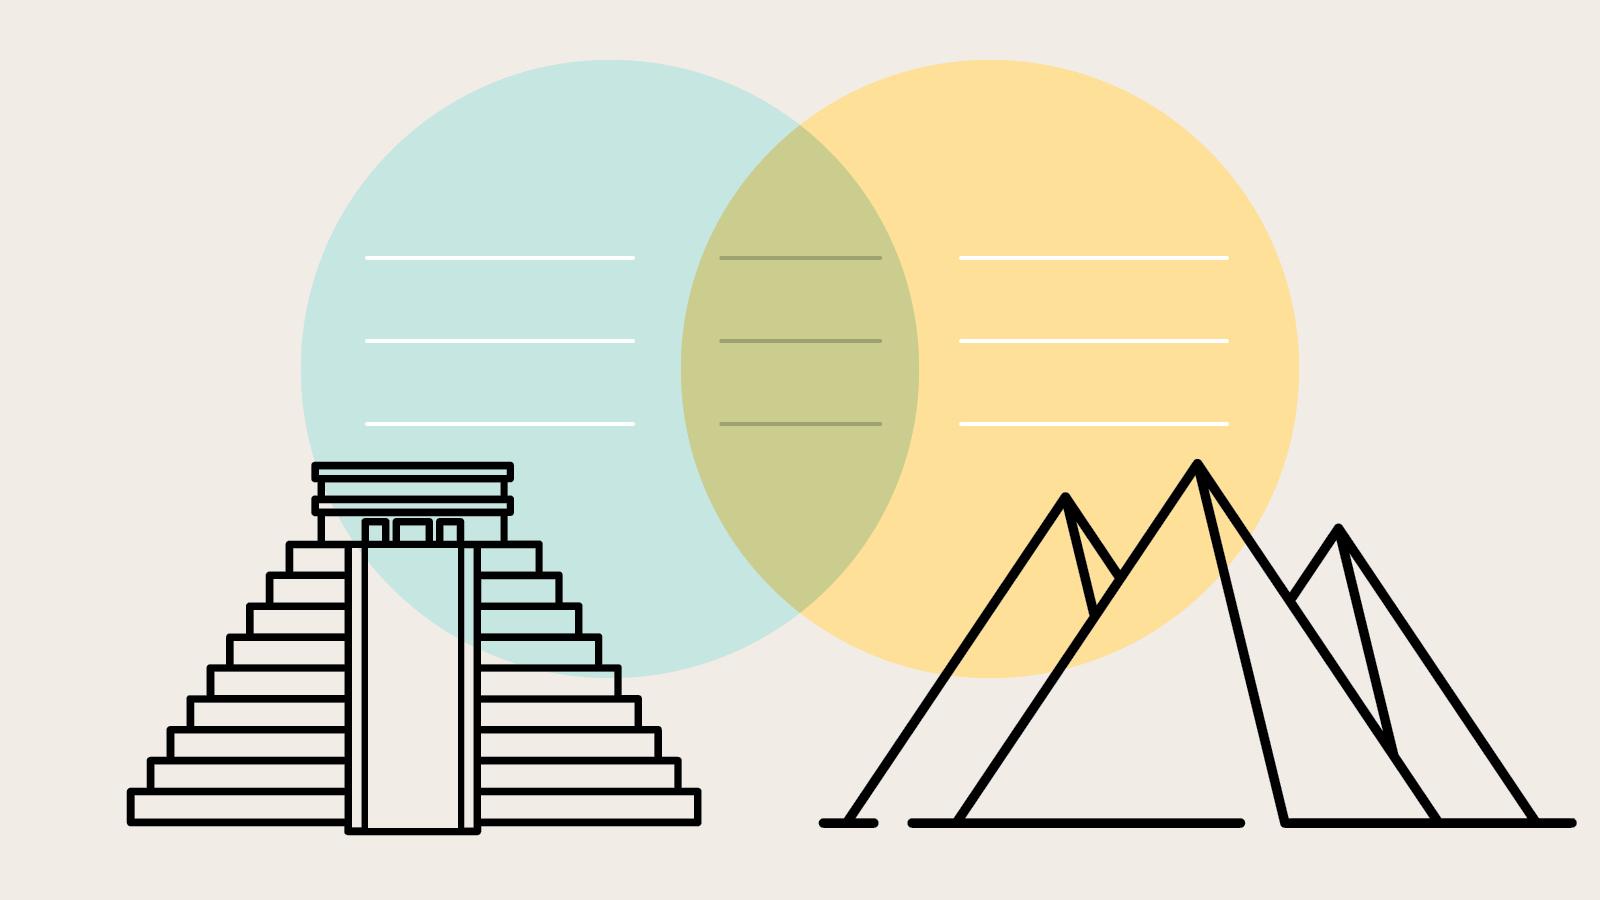 Mayan Pyramids vs. Egyptian Pyramids Lesson Plan Idea